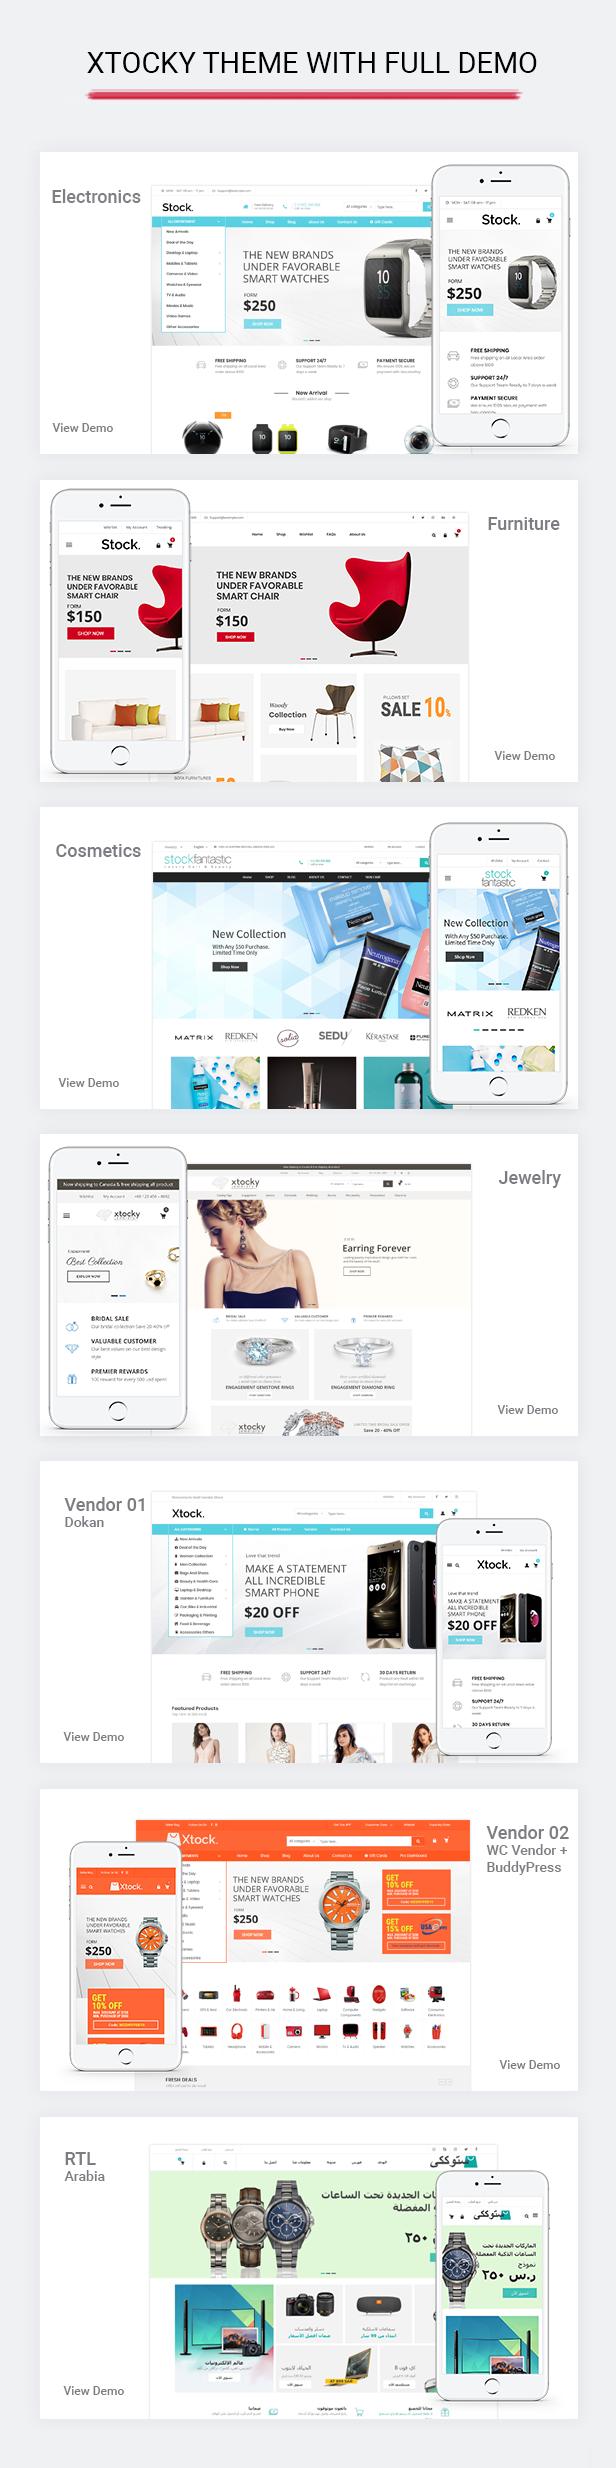 Xtocky - WooCommerce Responsive Theme - 4